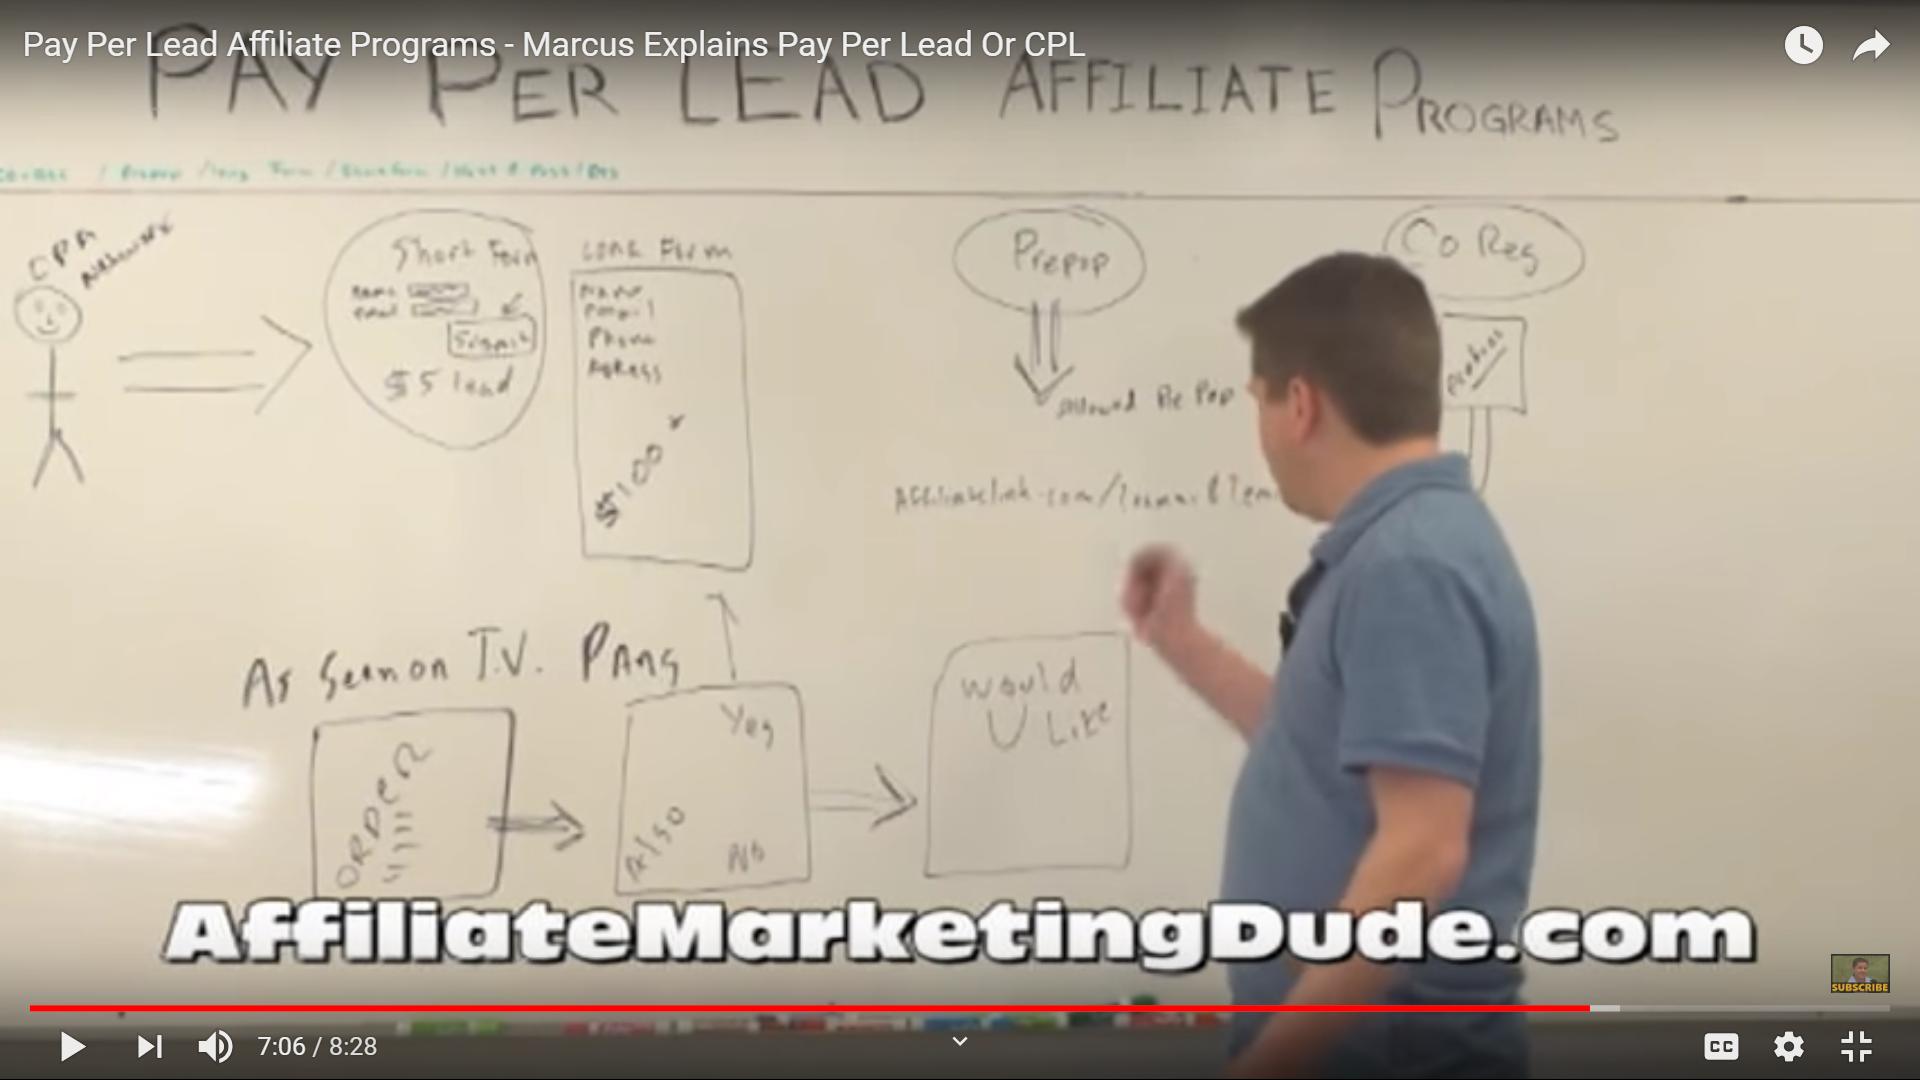 Pay Per Lead Affiliate Programs Marcus Explains Pay Per Lead